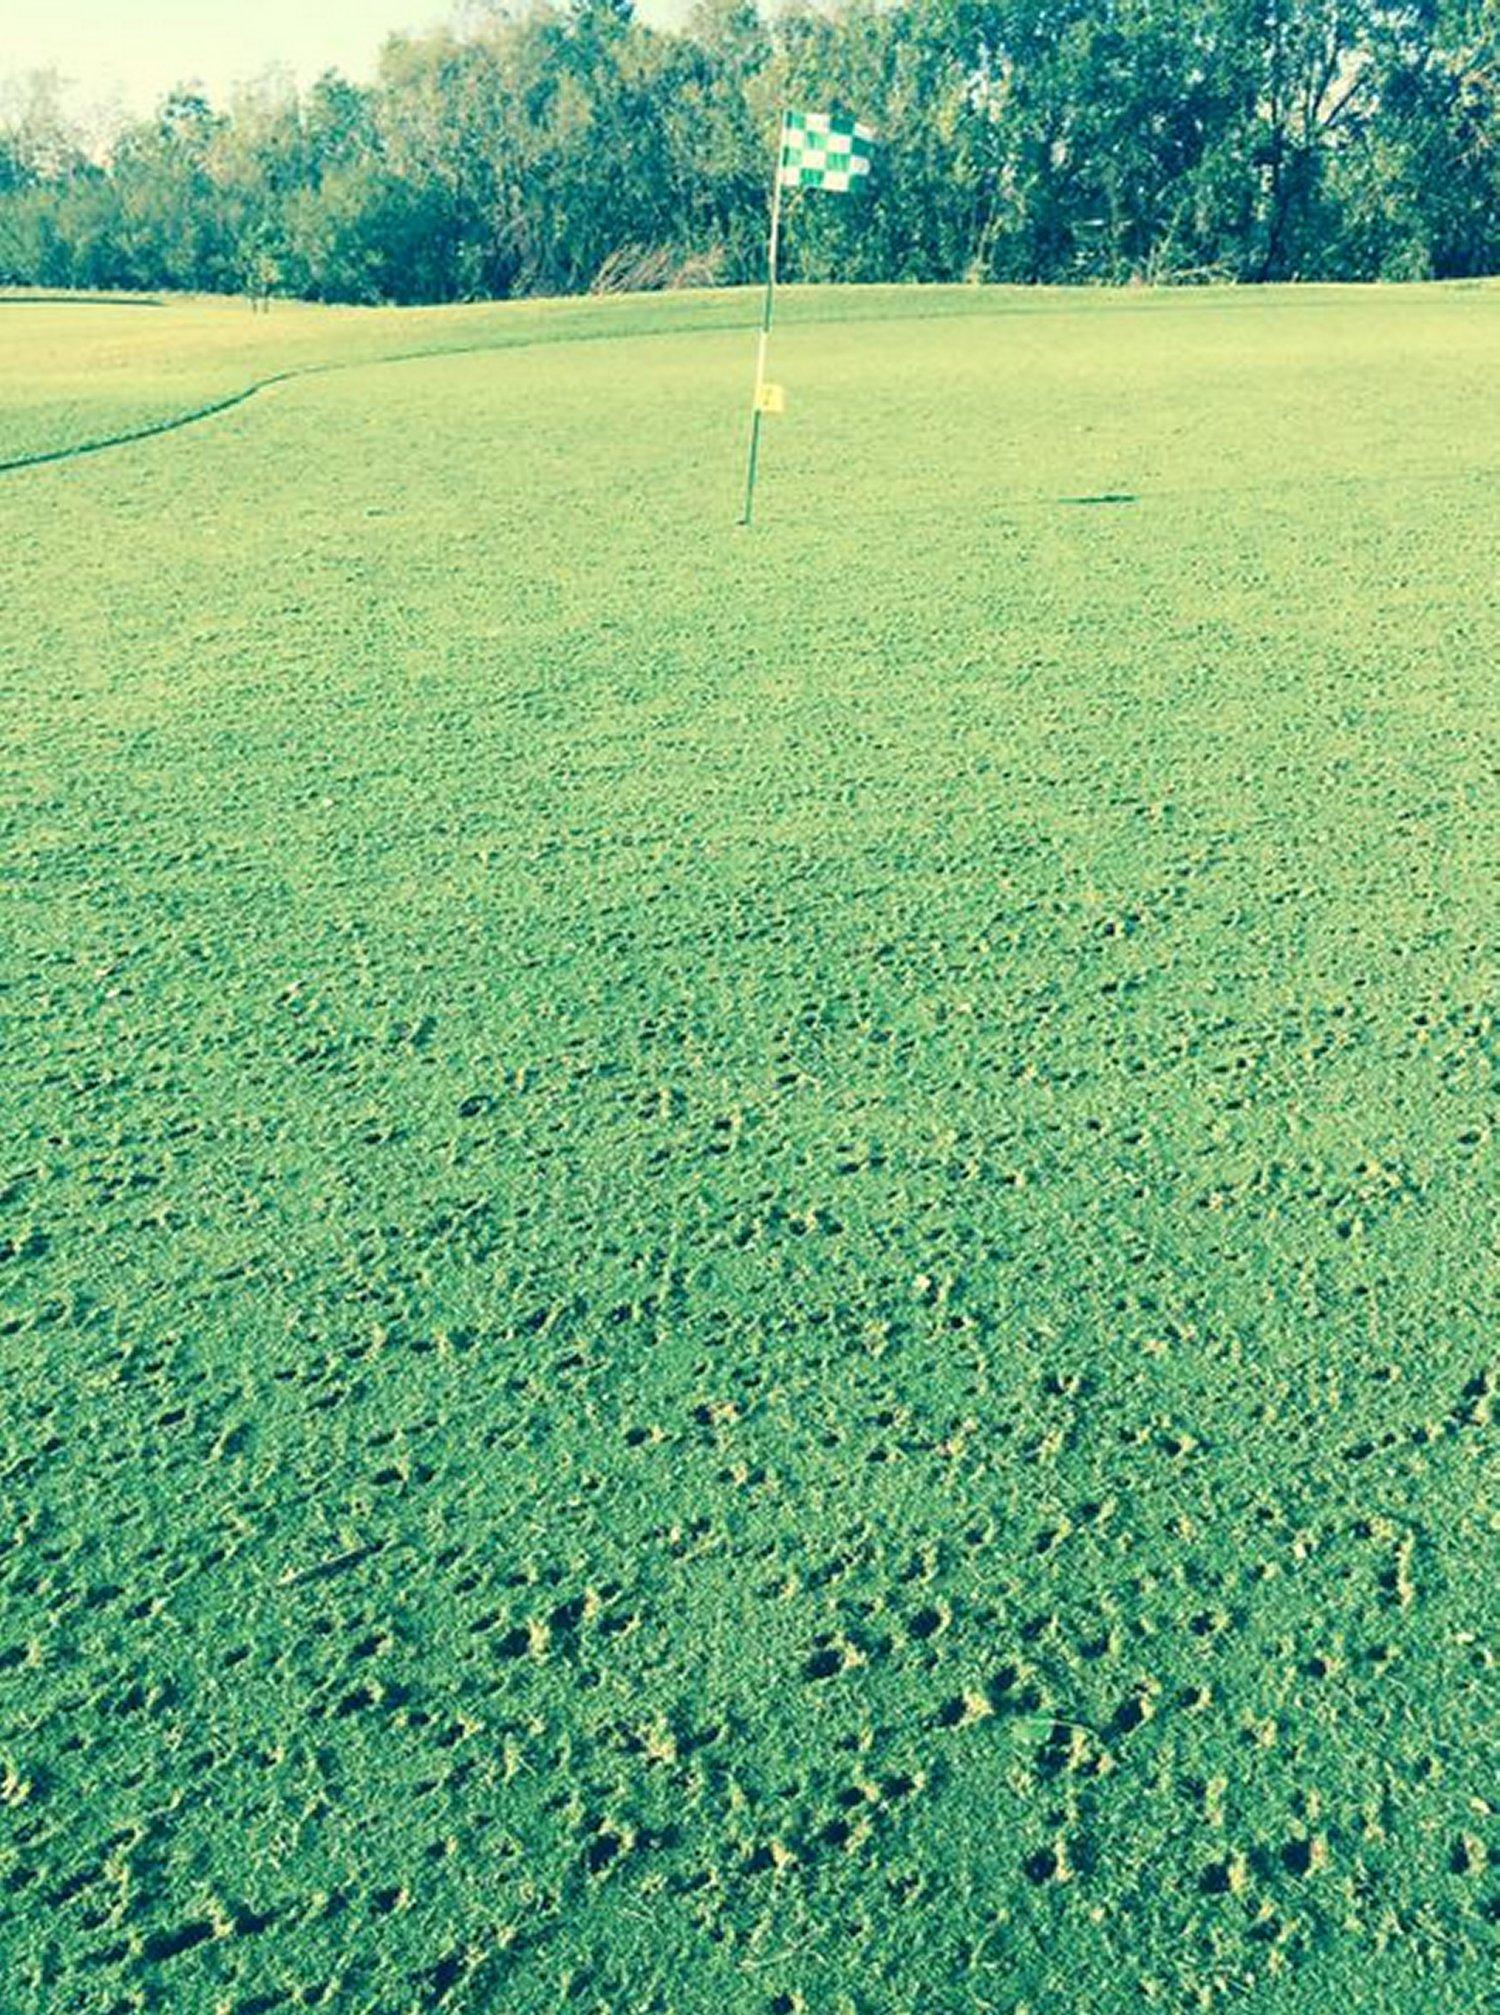 Golf green in Kerrobert, SK badly damaged by the hail. (Source: Twitter - @EarlsSalesMarc)